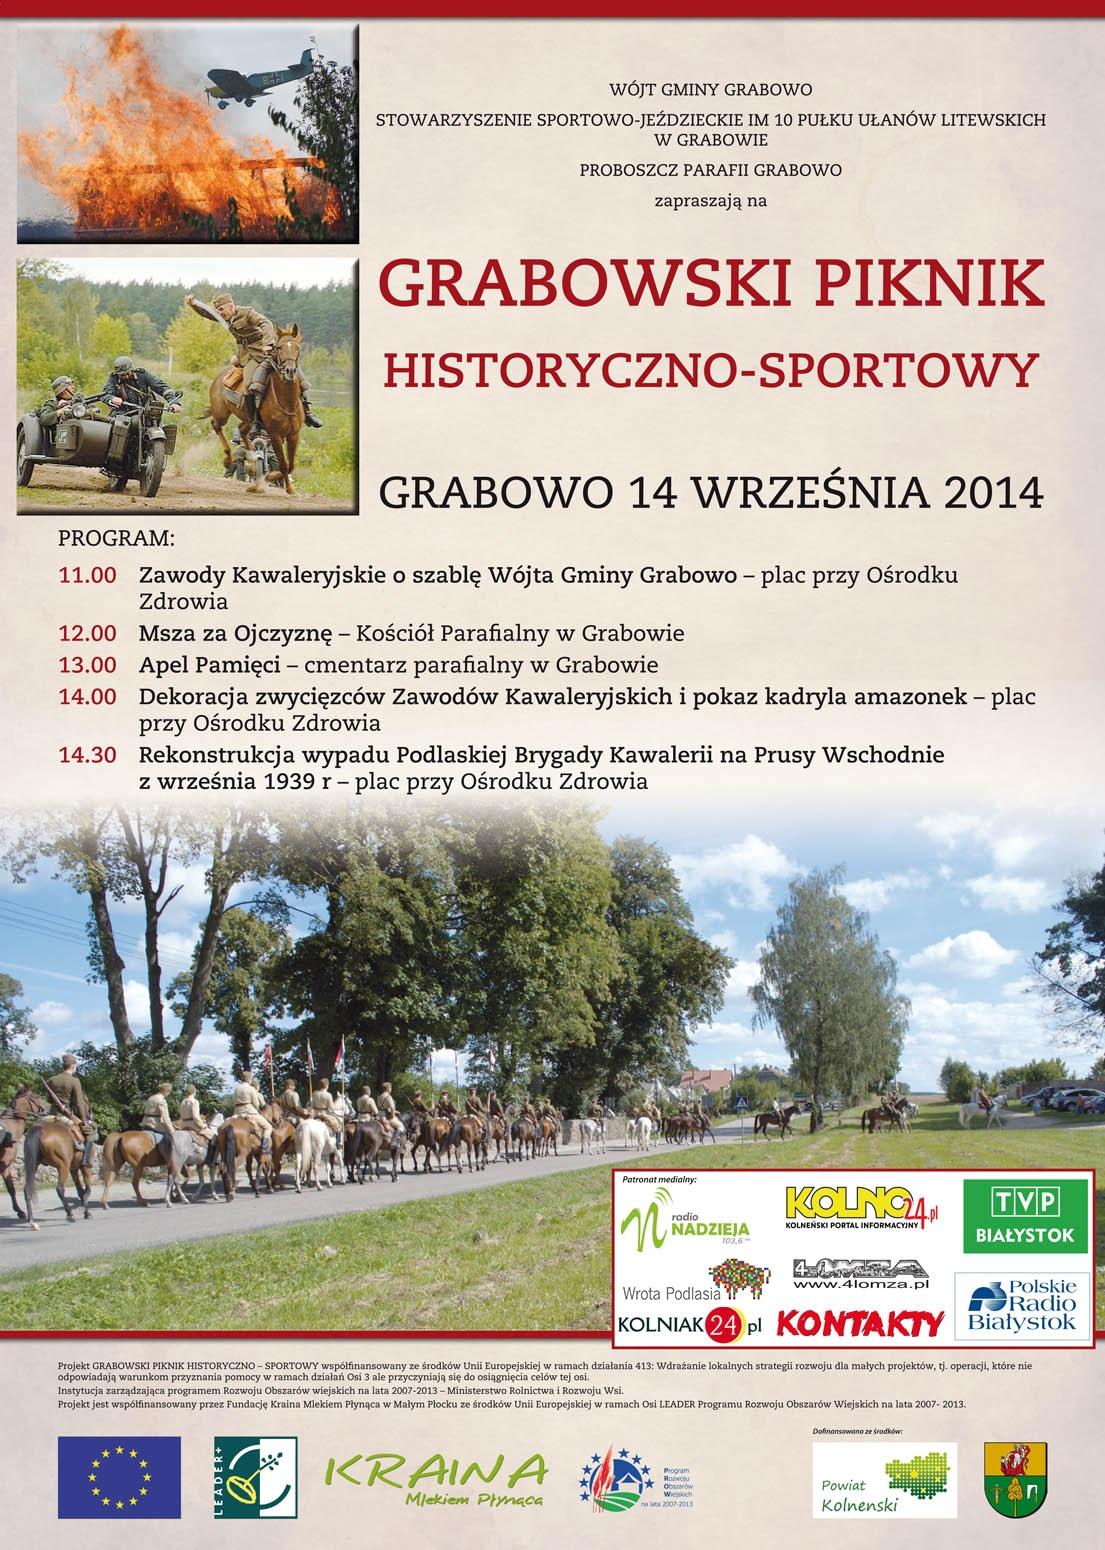 - grabowski_piknik_plakat.jpg